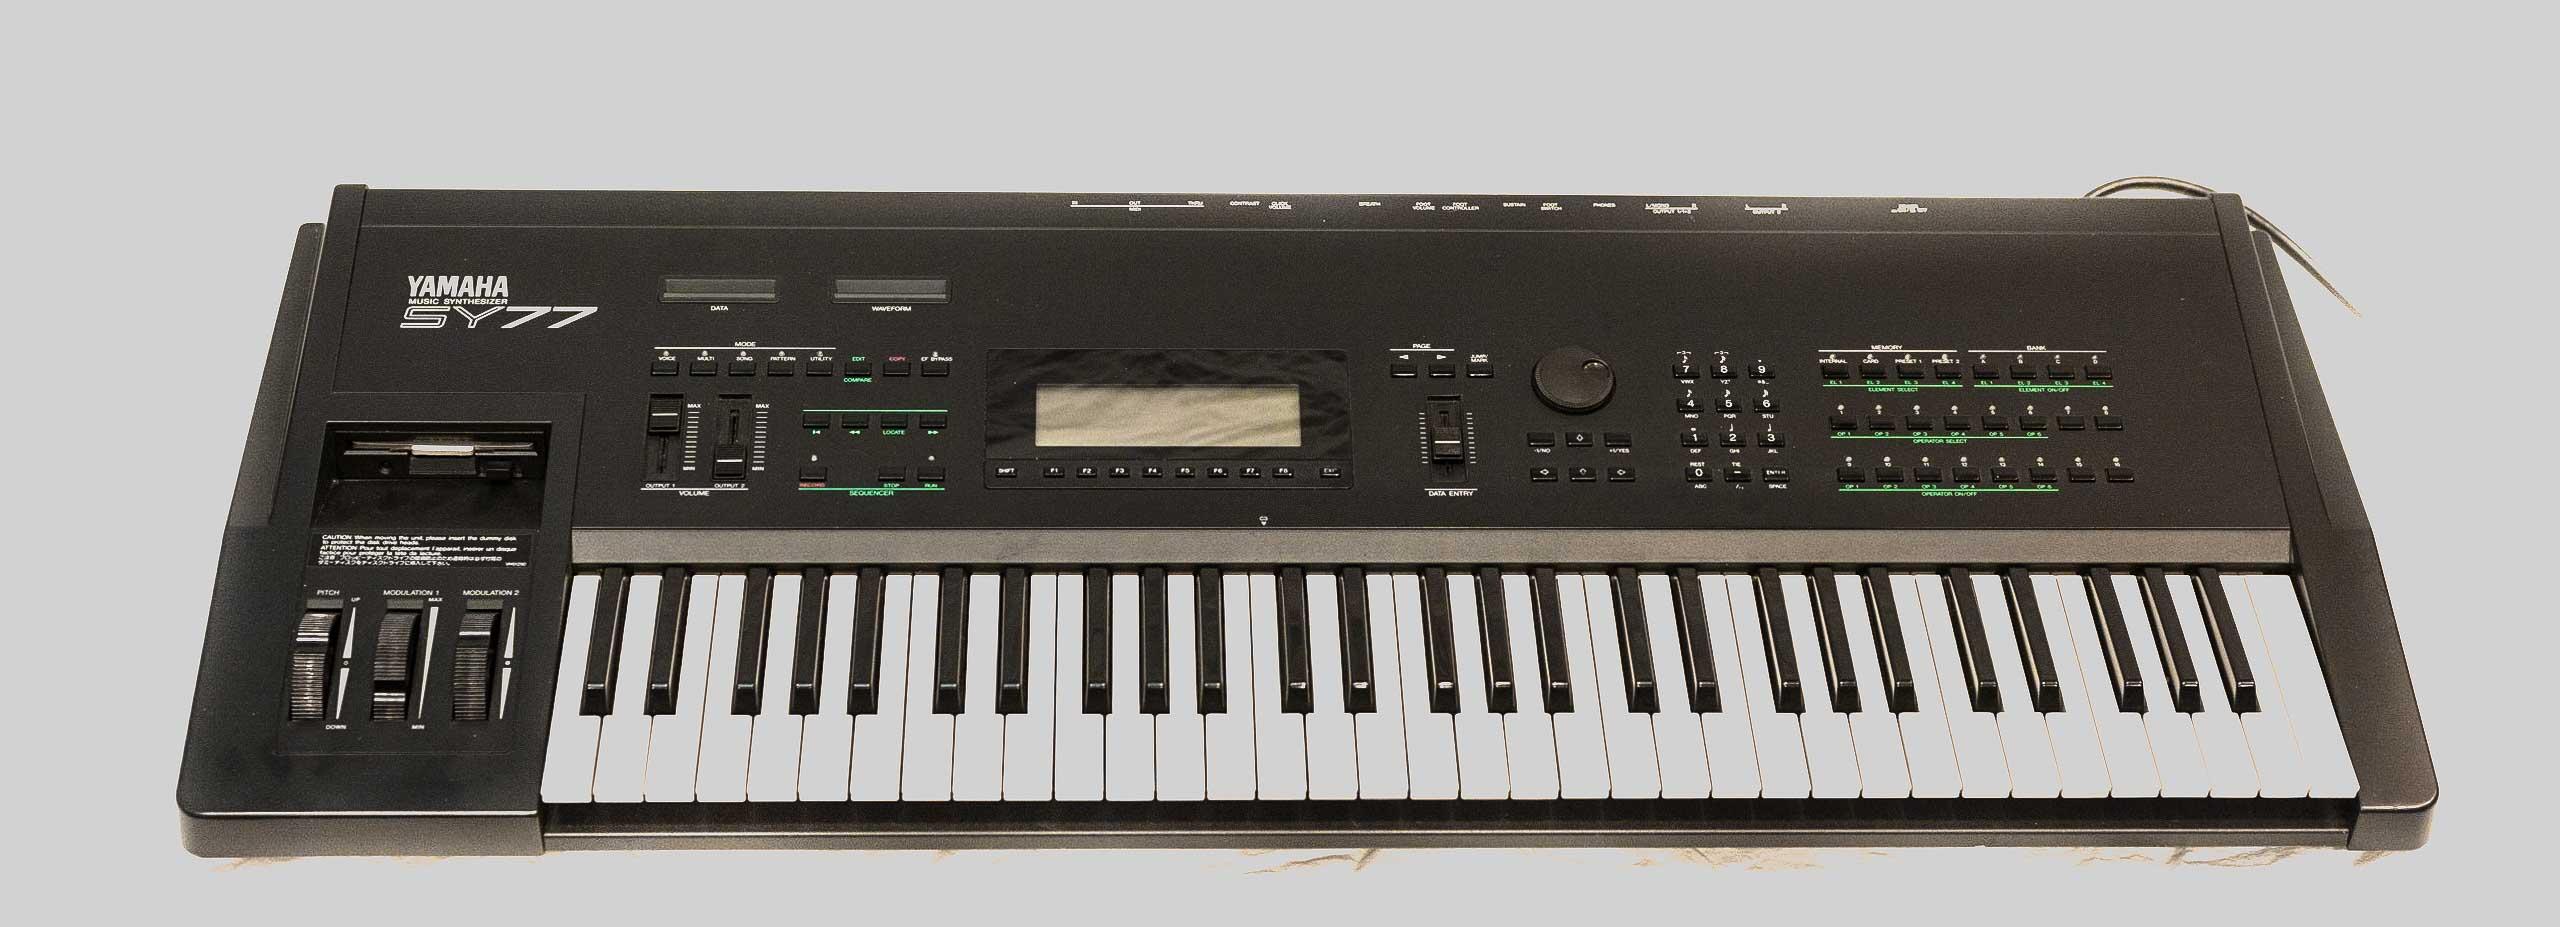 Yamaha SY77 front panel